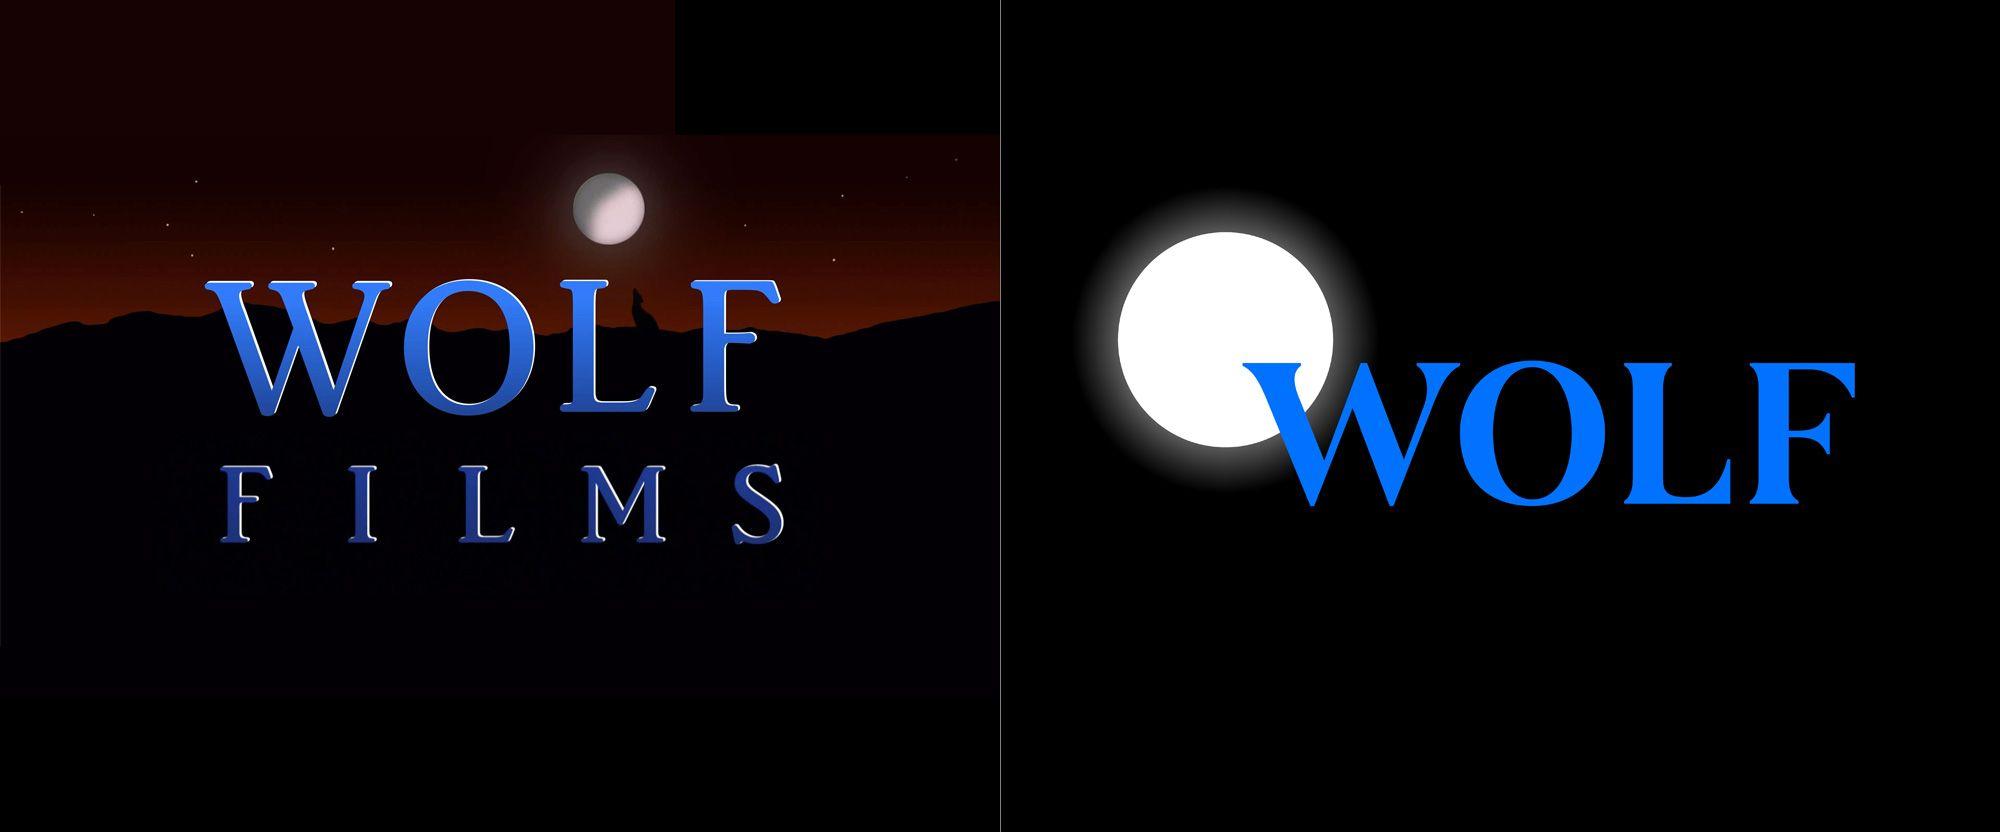 New Logo For Wolf Films By Chermayeff Geismar Haviv Graphic